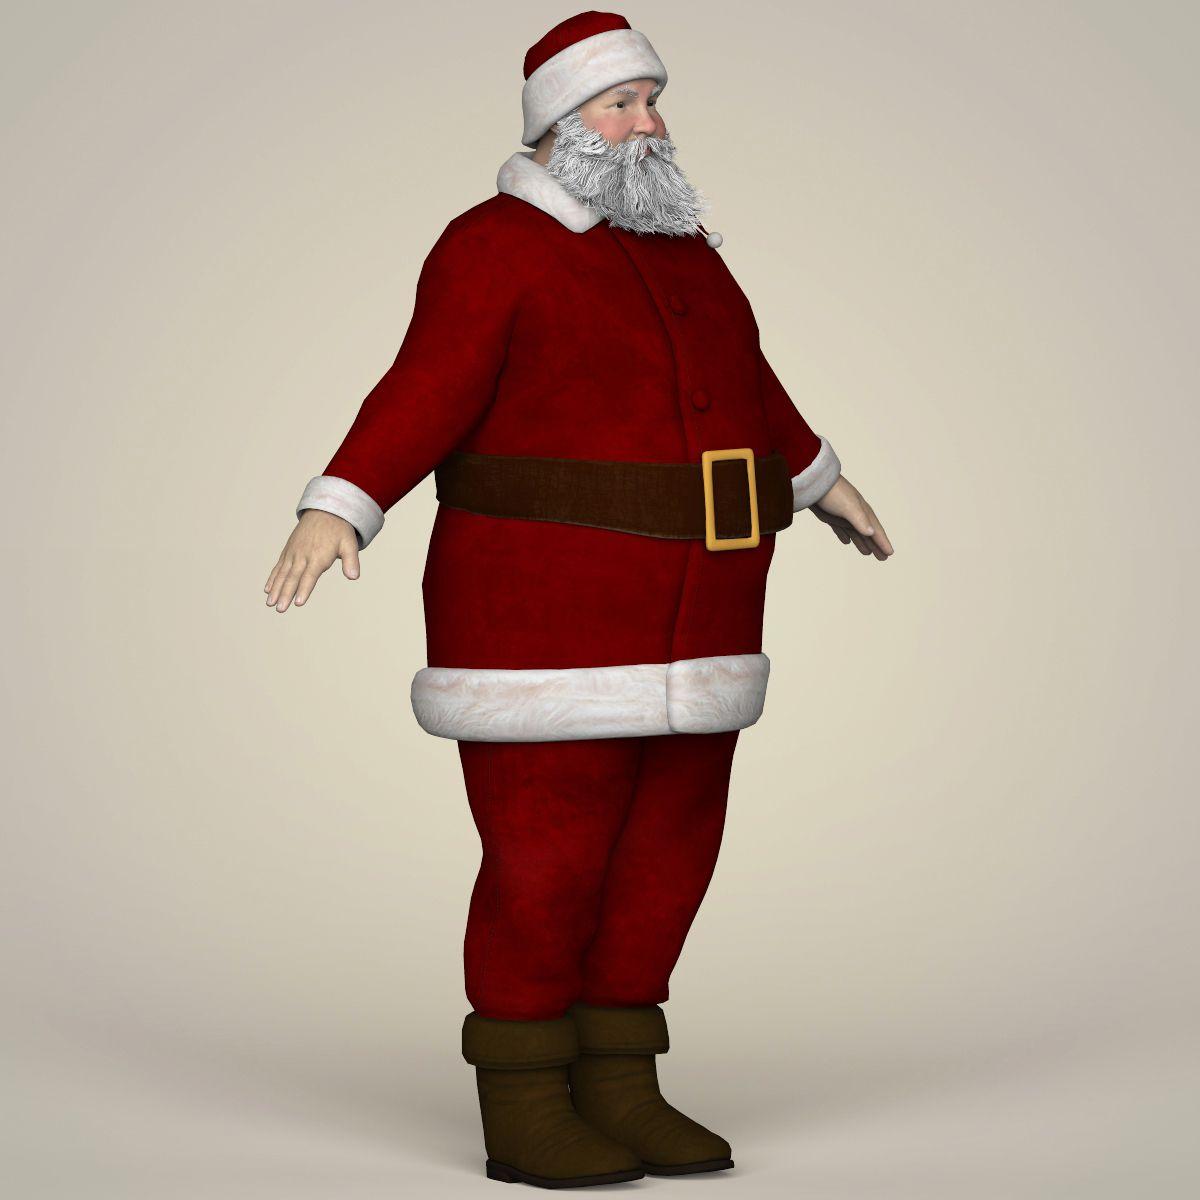 Santa Claus Santa Claus Santa Claus Santa Clause